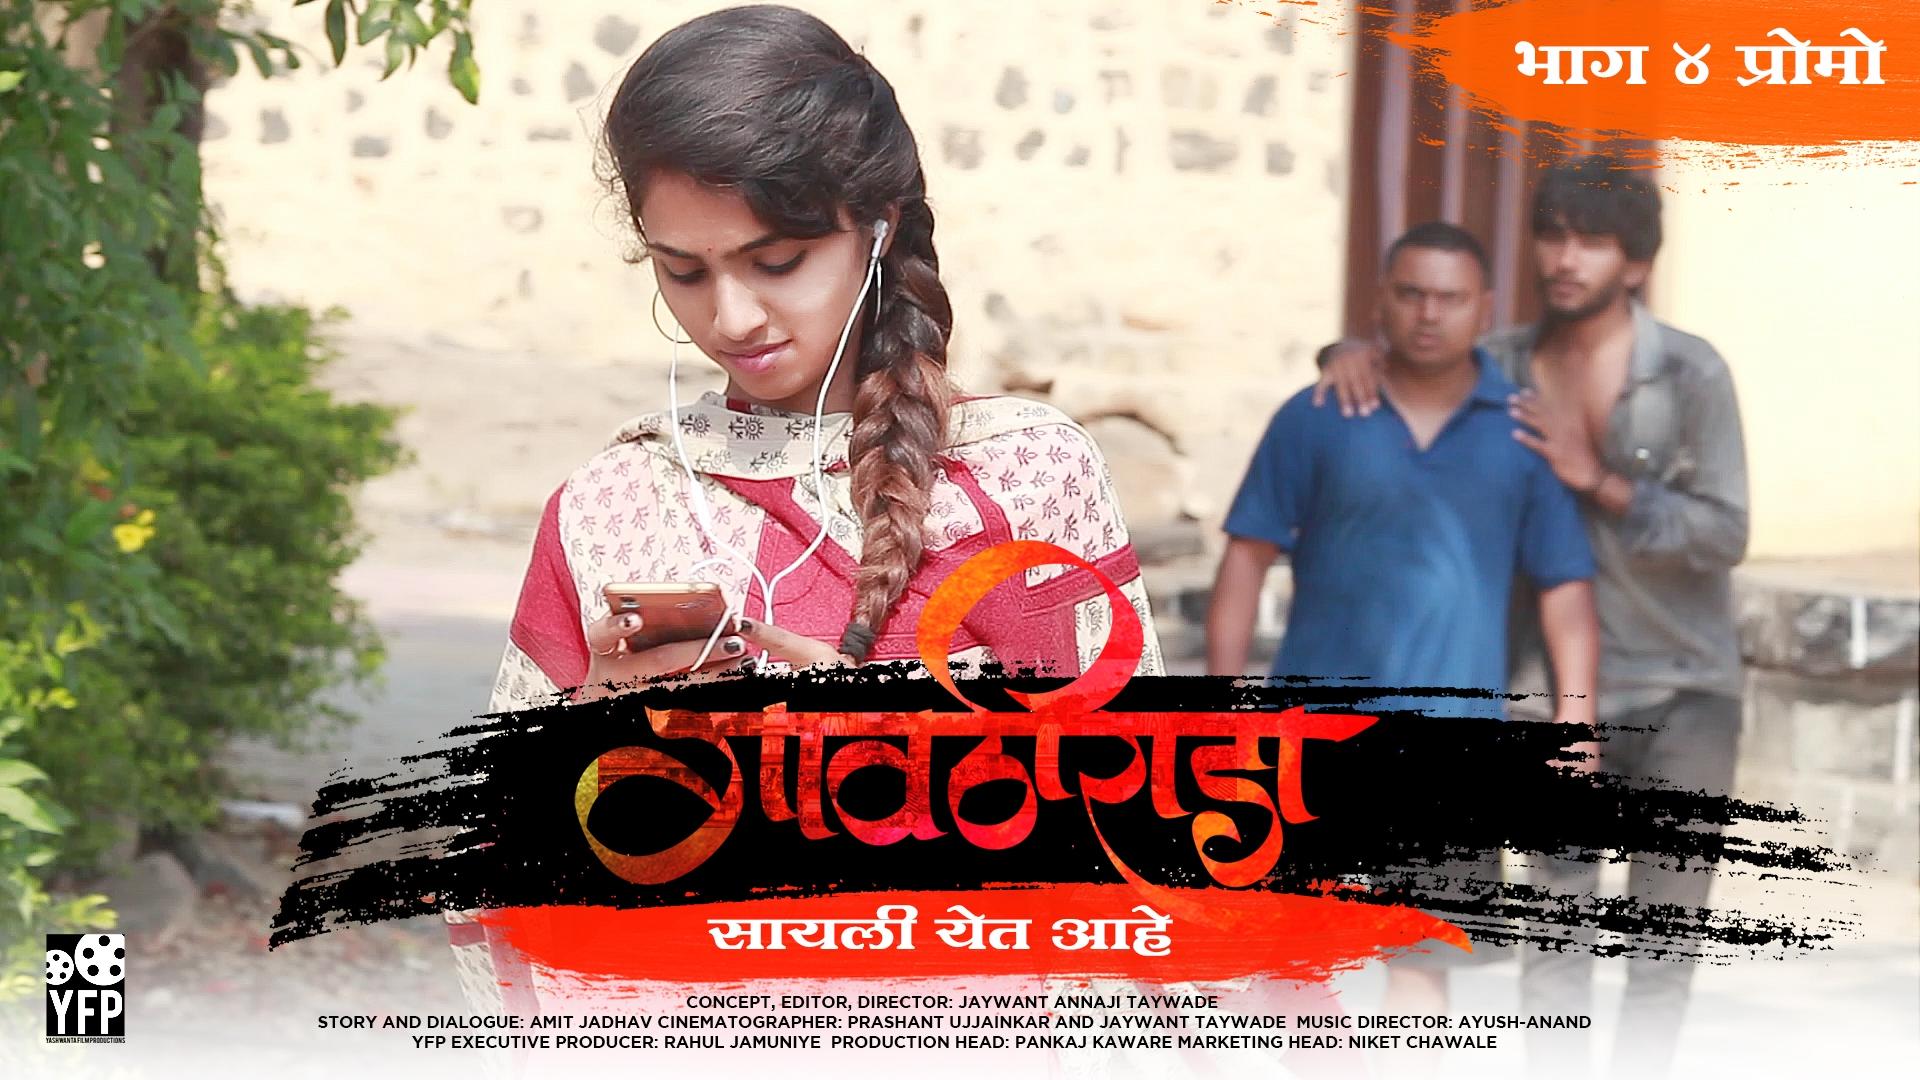 marathi web series gavthi rada comedy web series marathi Drama 2019